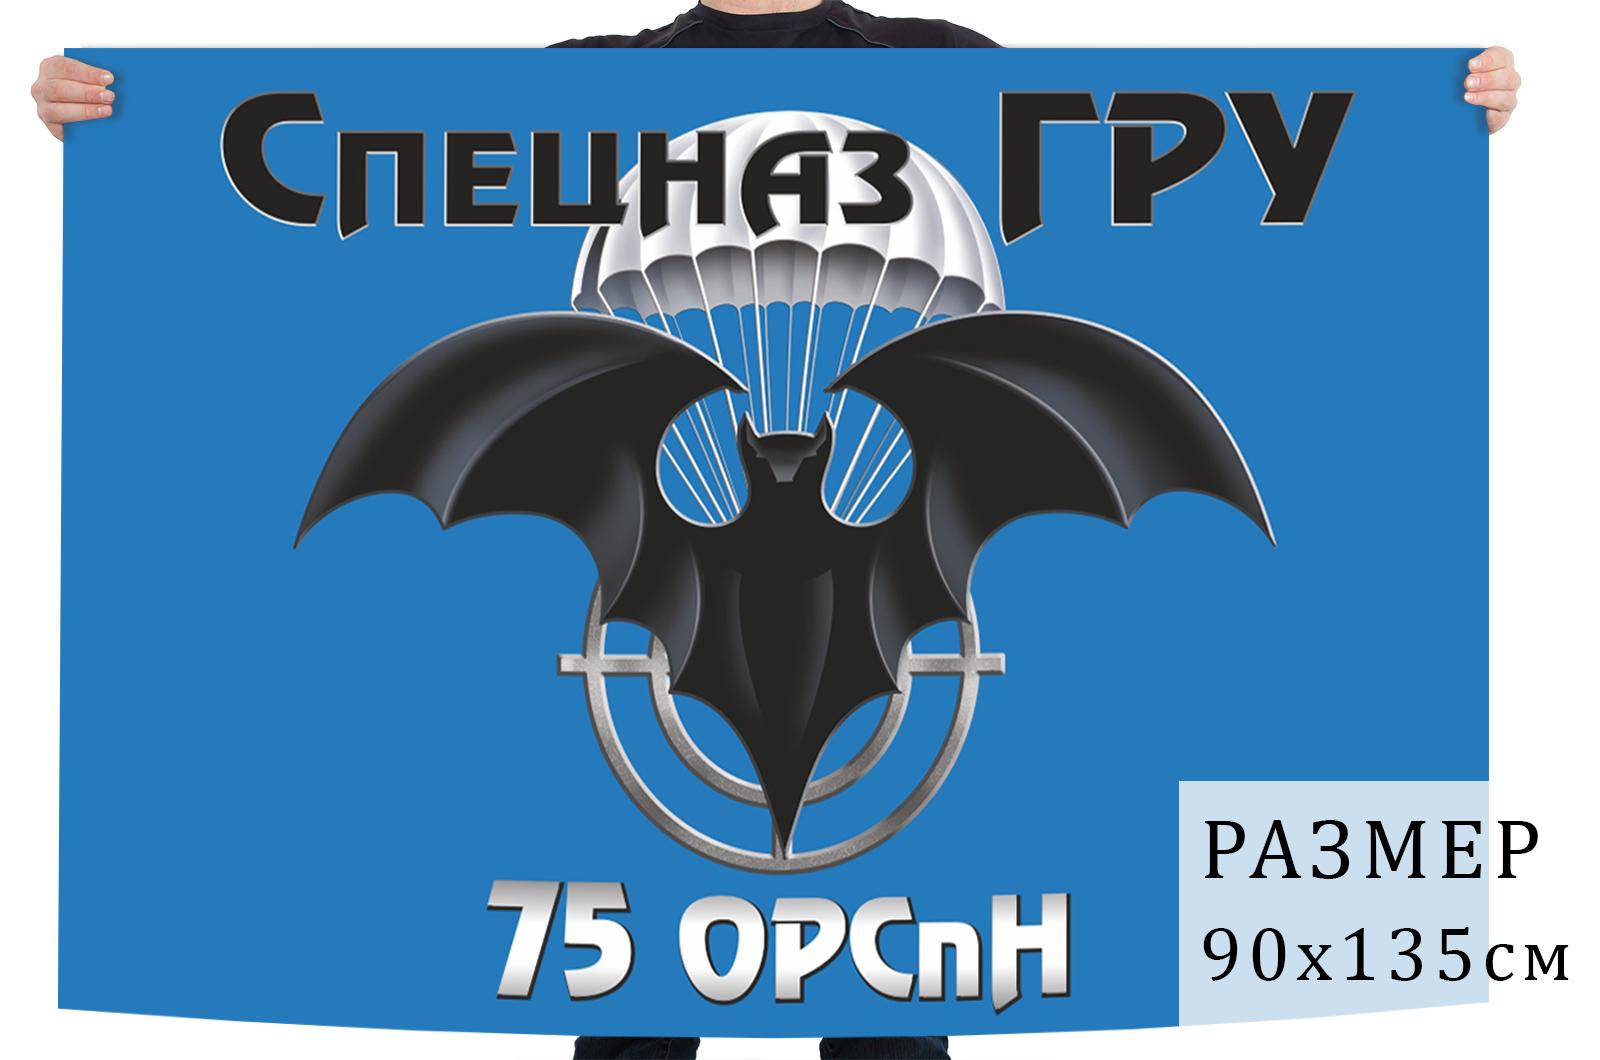 Флаг 75 ОРСпН спецназа ГРУ